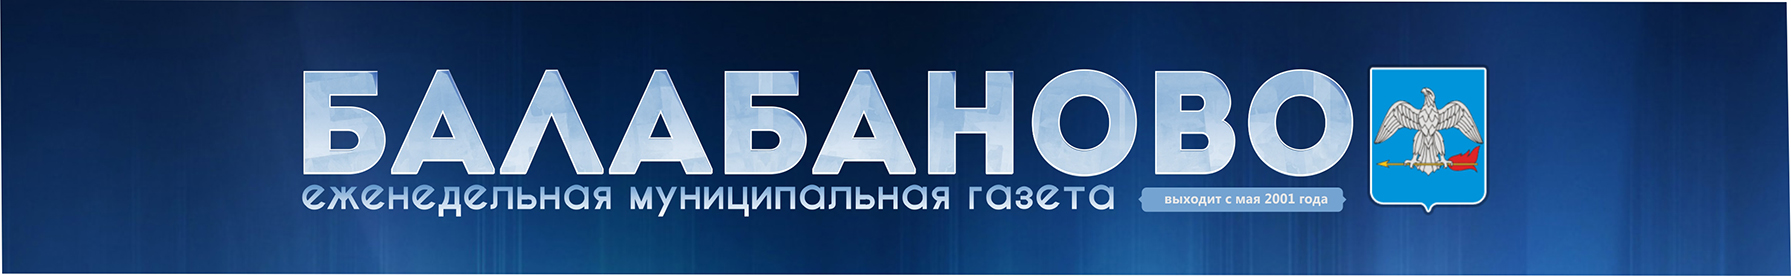 Сайт газеты Балабаново